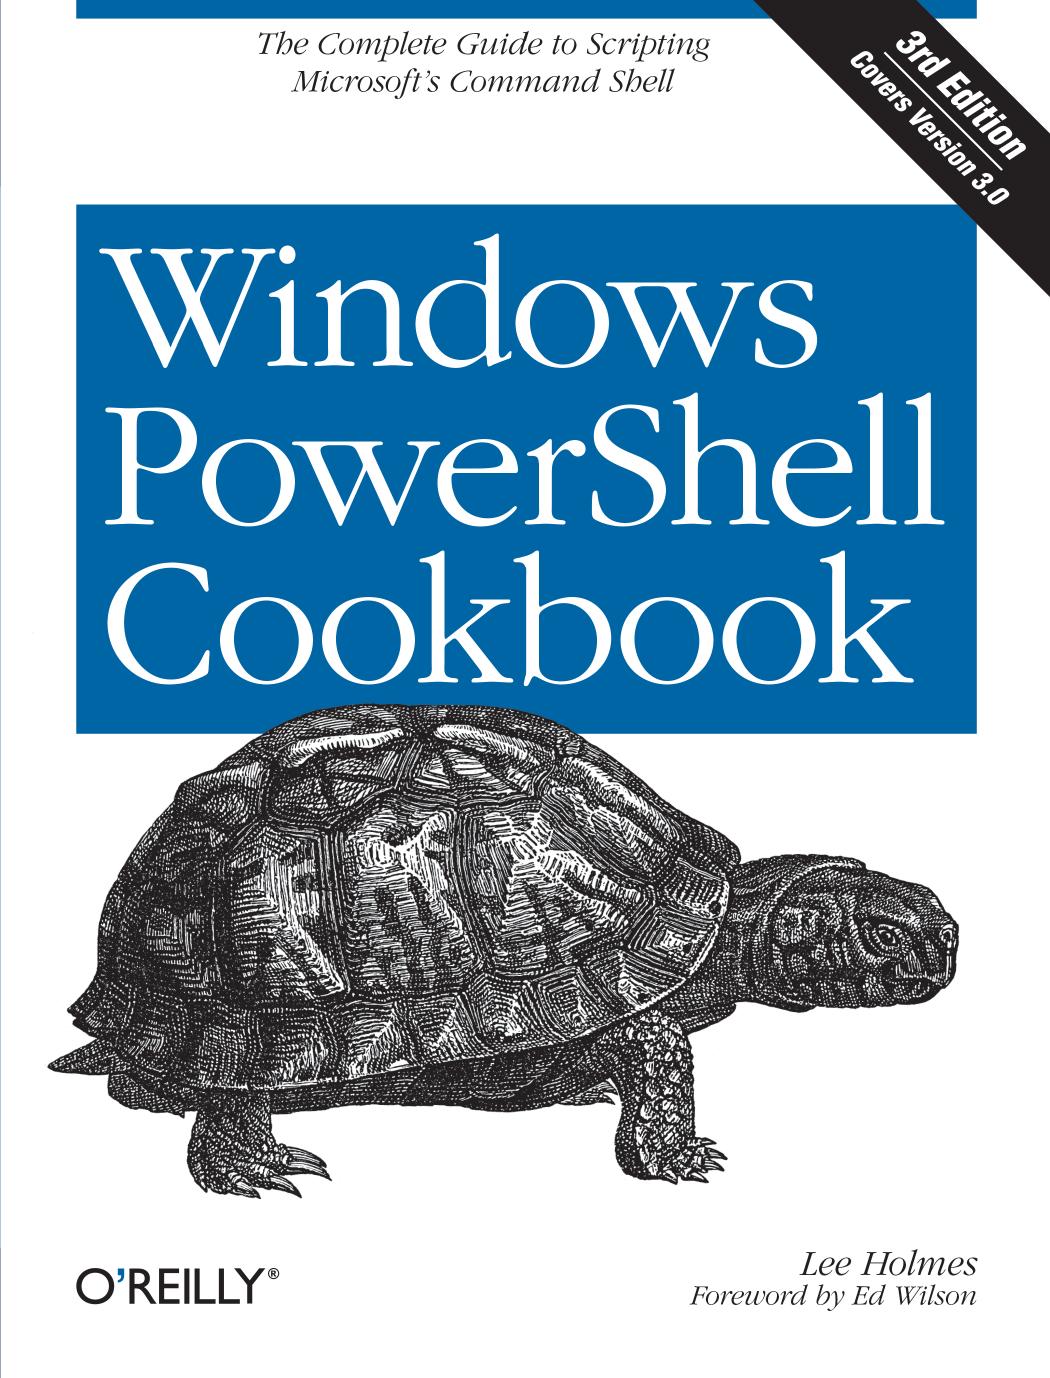 Windows PowerShell Cookbook - Automatic Packing Machine   manualzz com